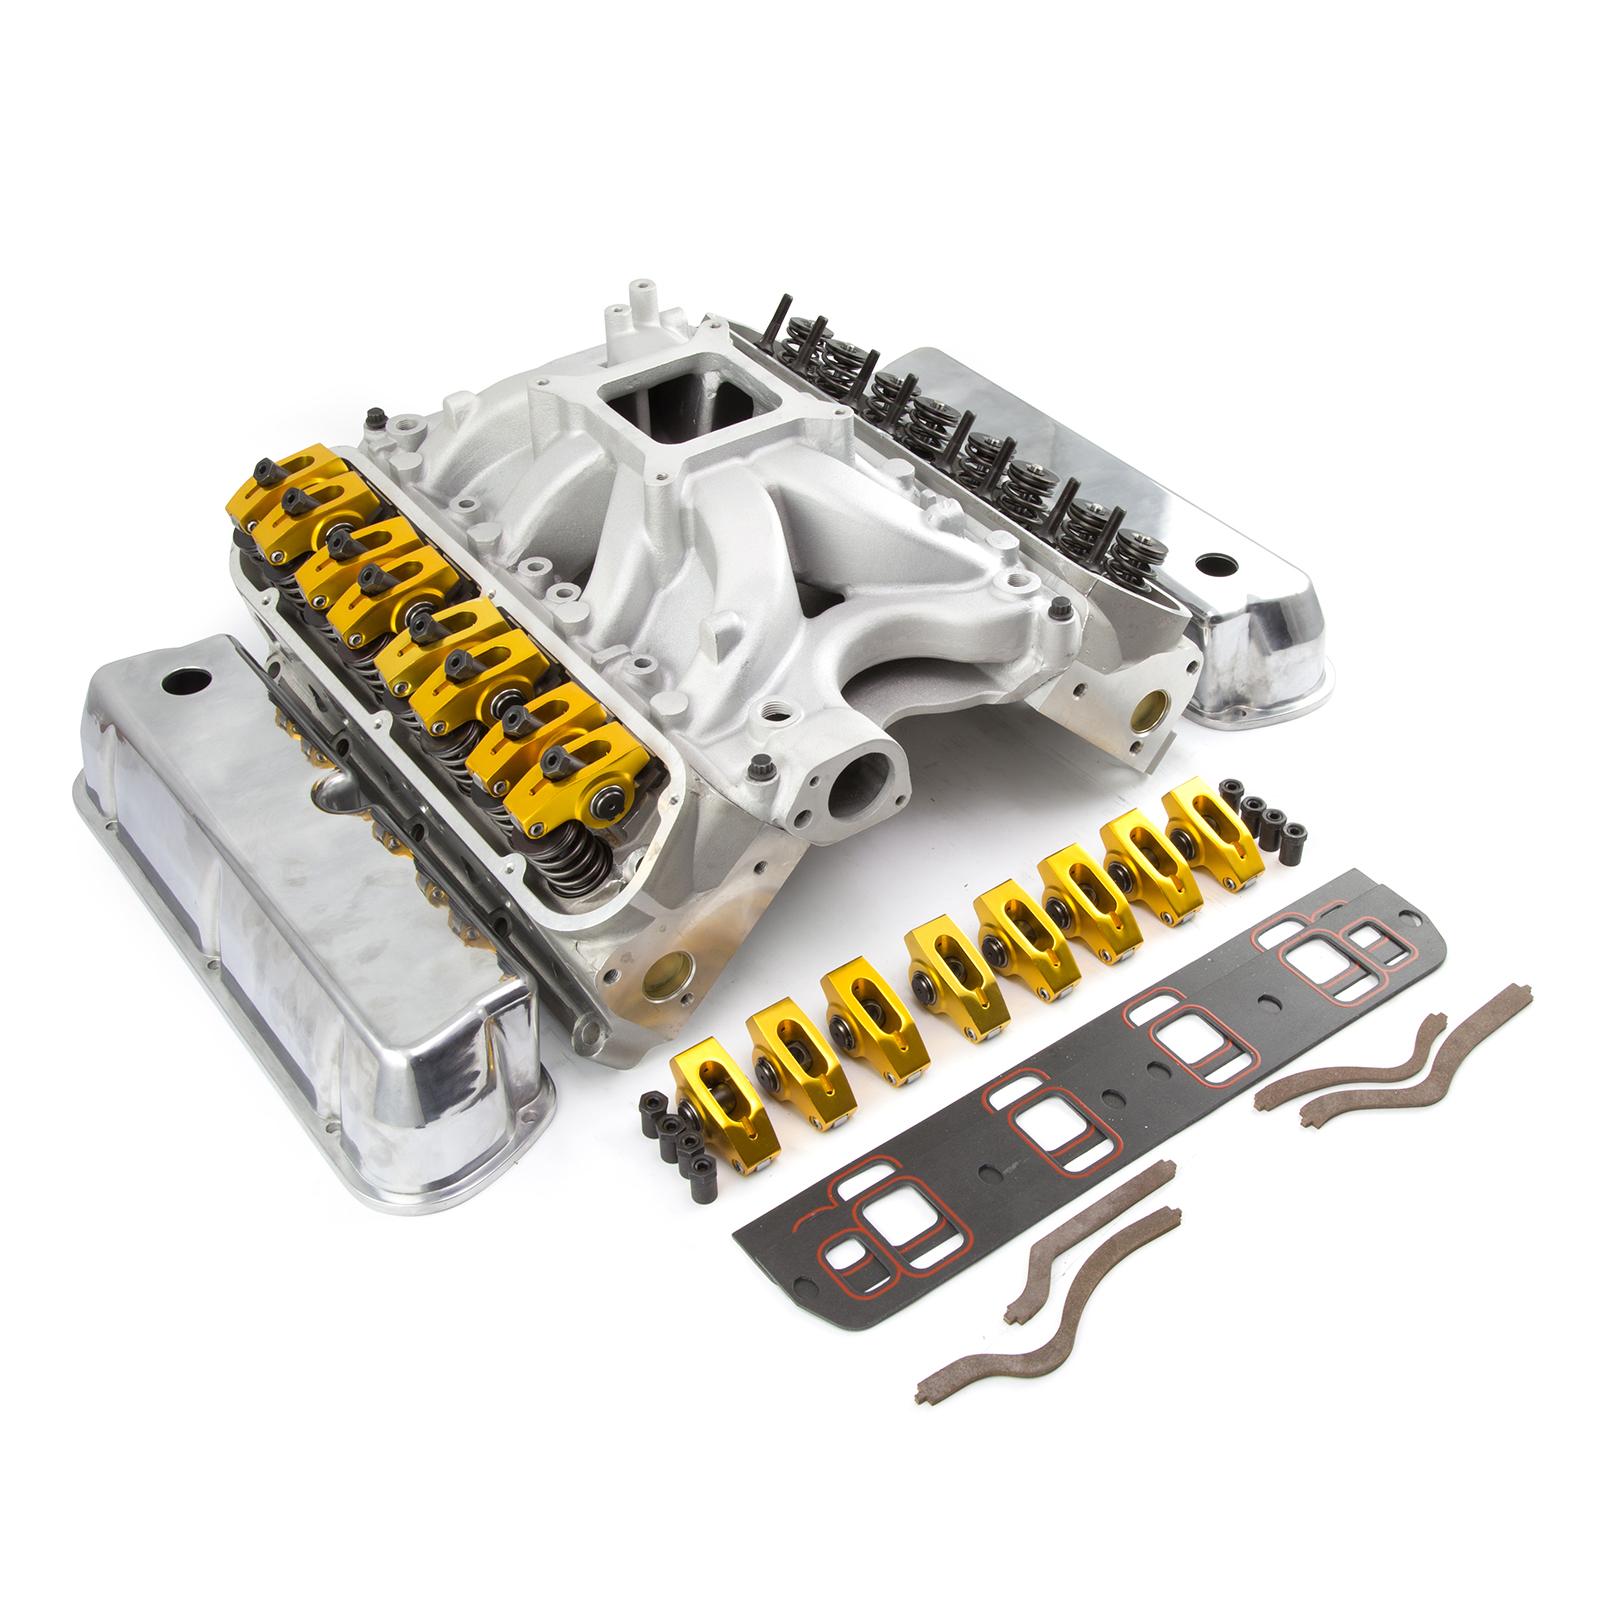 Ford 351W Windsor Solid Roller CNC Cylinder Head Top End Engine Combo Kit